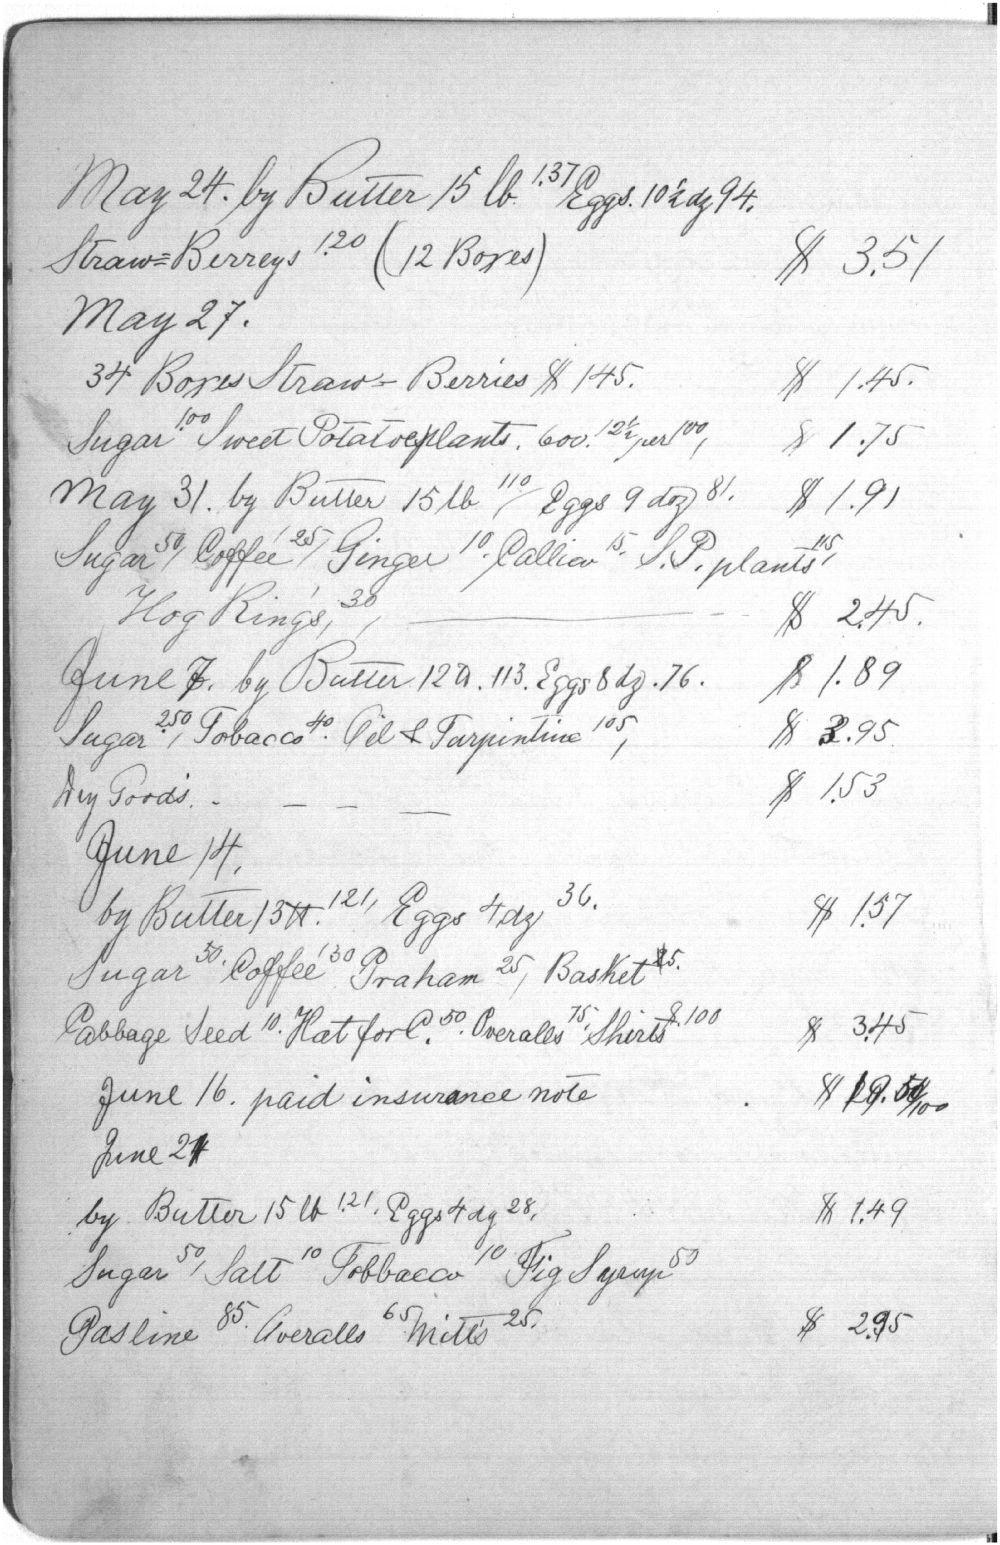 Augusta Bruchmiller memorandum book - 6